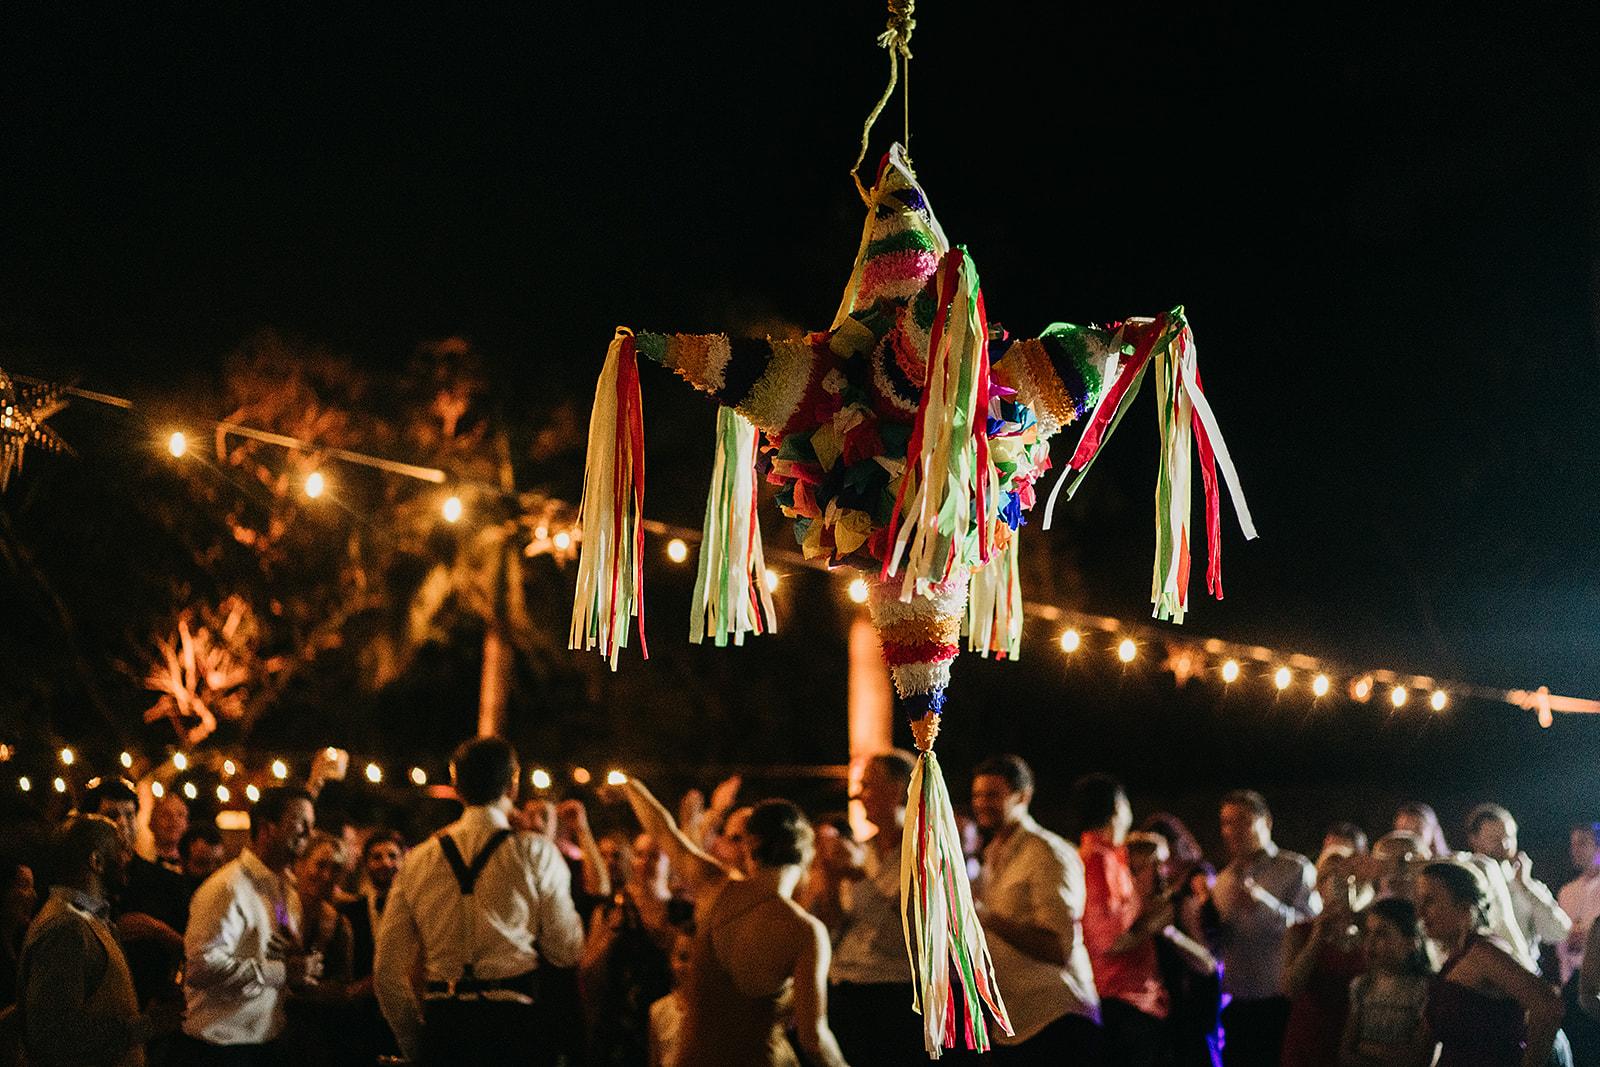 AmandaMarkus-Hacienda-Sac-Chich-Merida-Wedding-816_websize.jpg